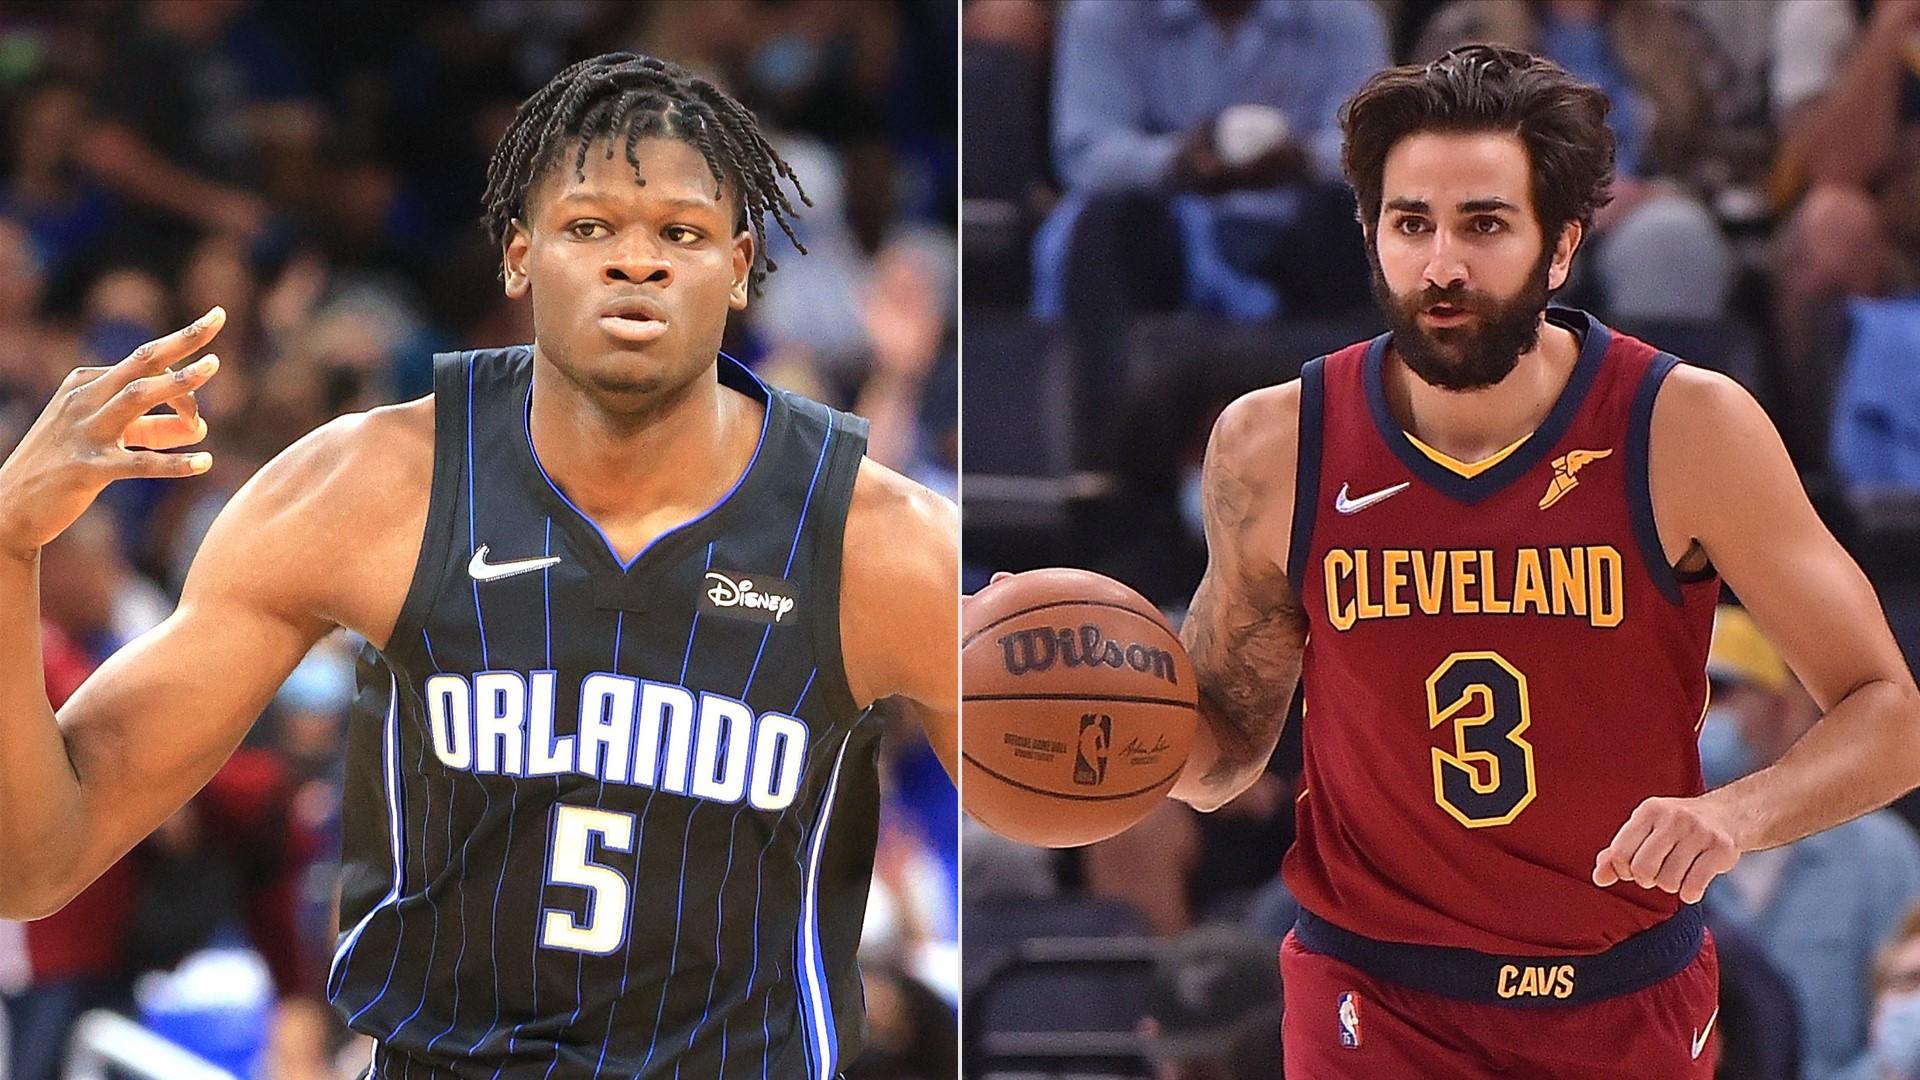 sportingnews.com - Kyle Irving - Fantasy Basketball waiver wire pickups for Week 2